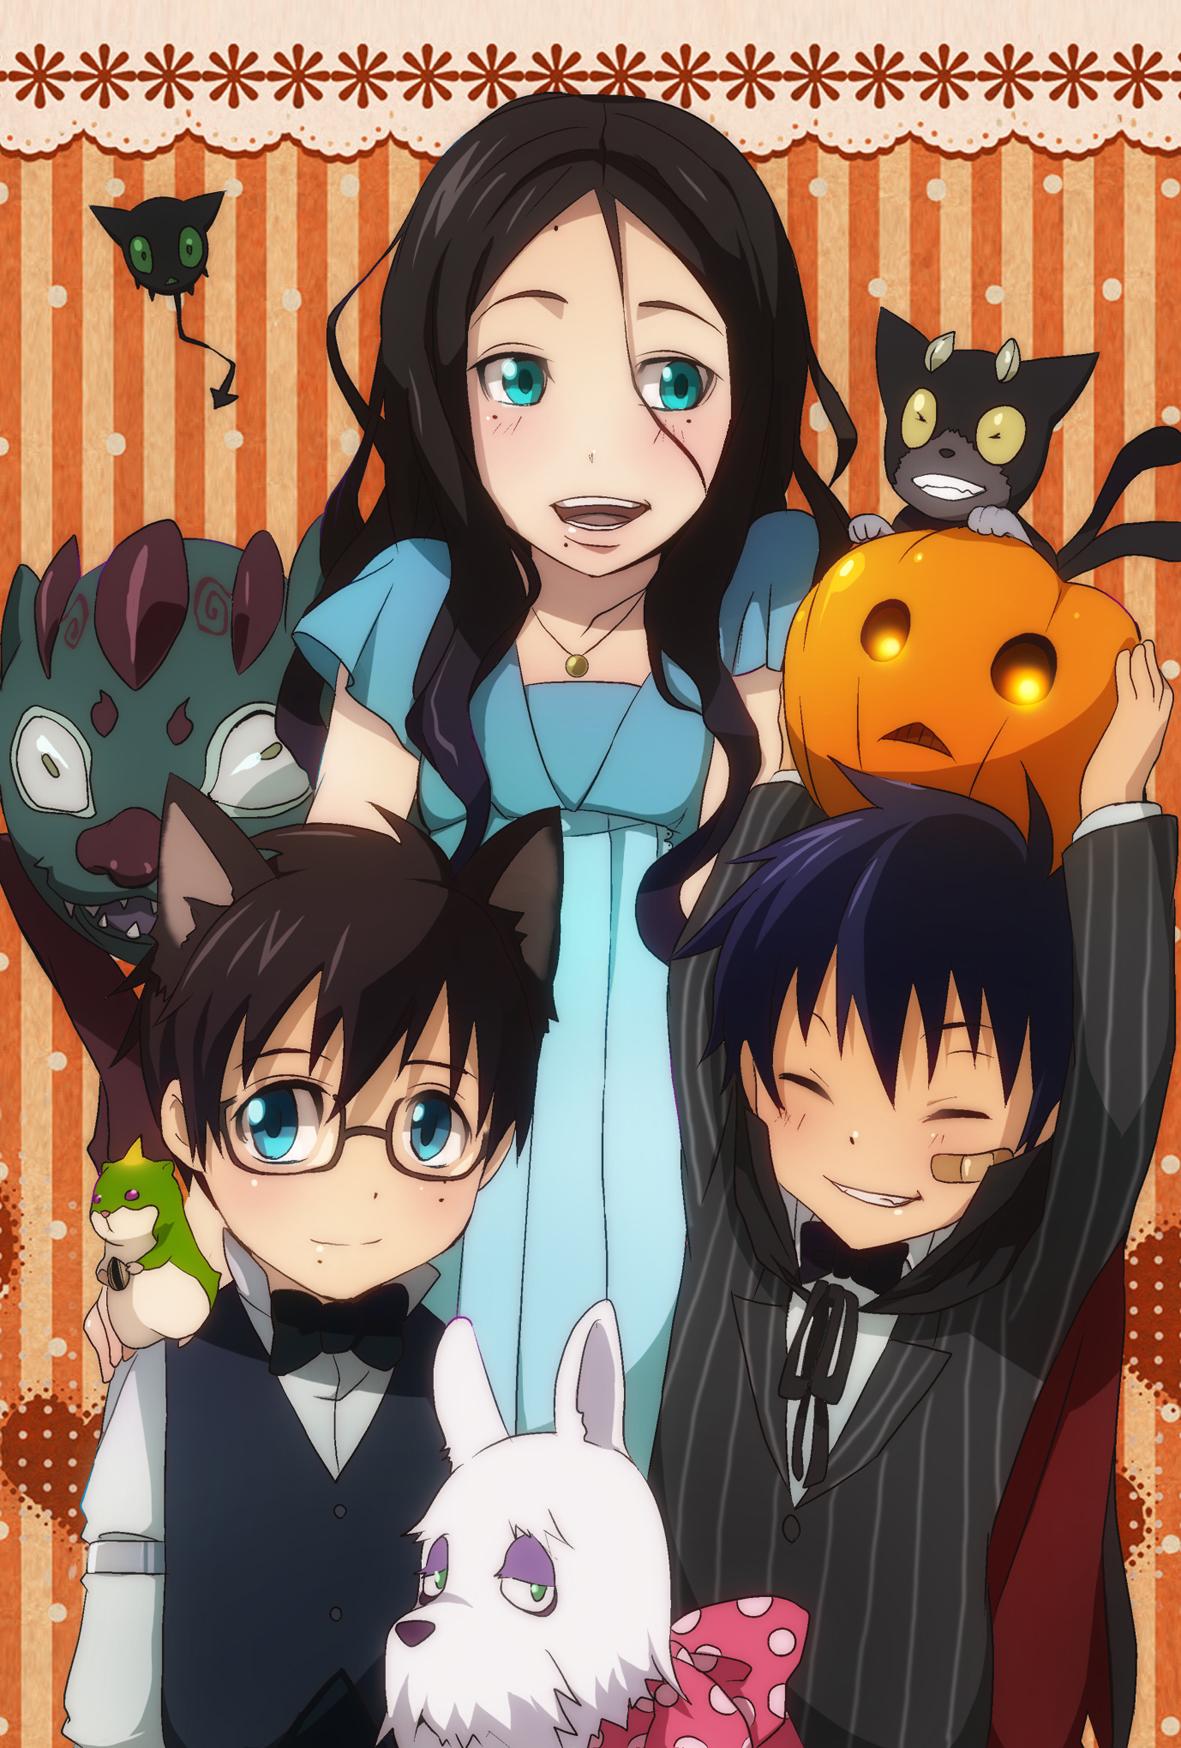 Neko Girl Live Wallpaper Halloween Image Pack